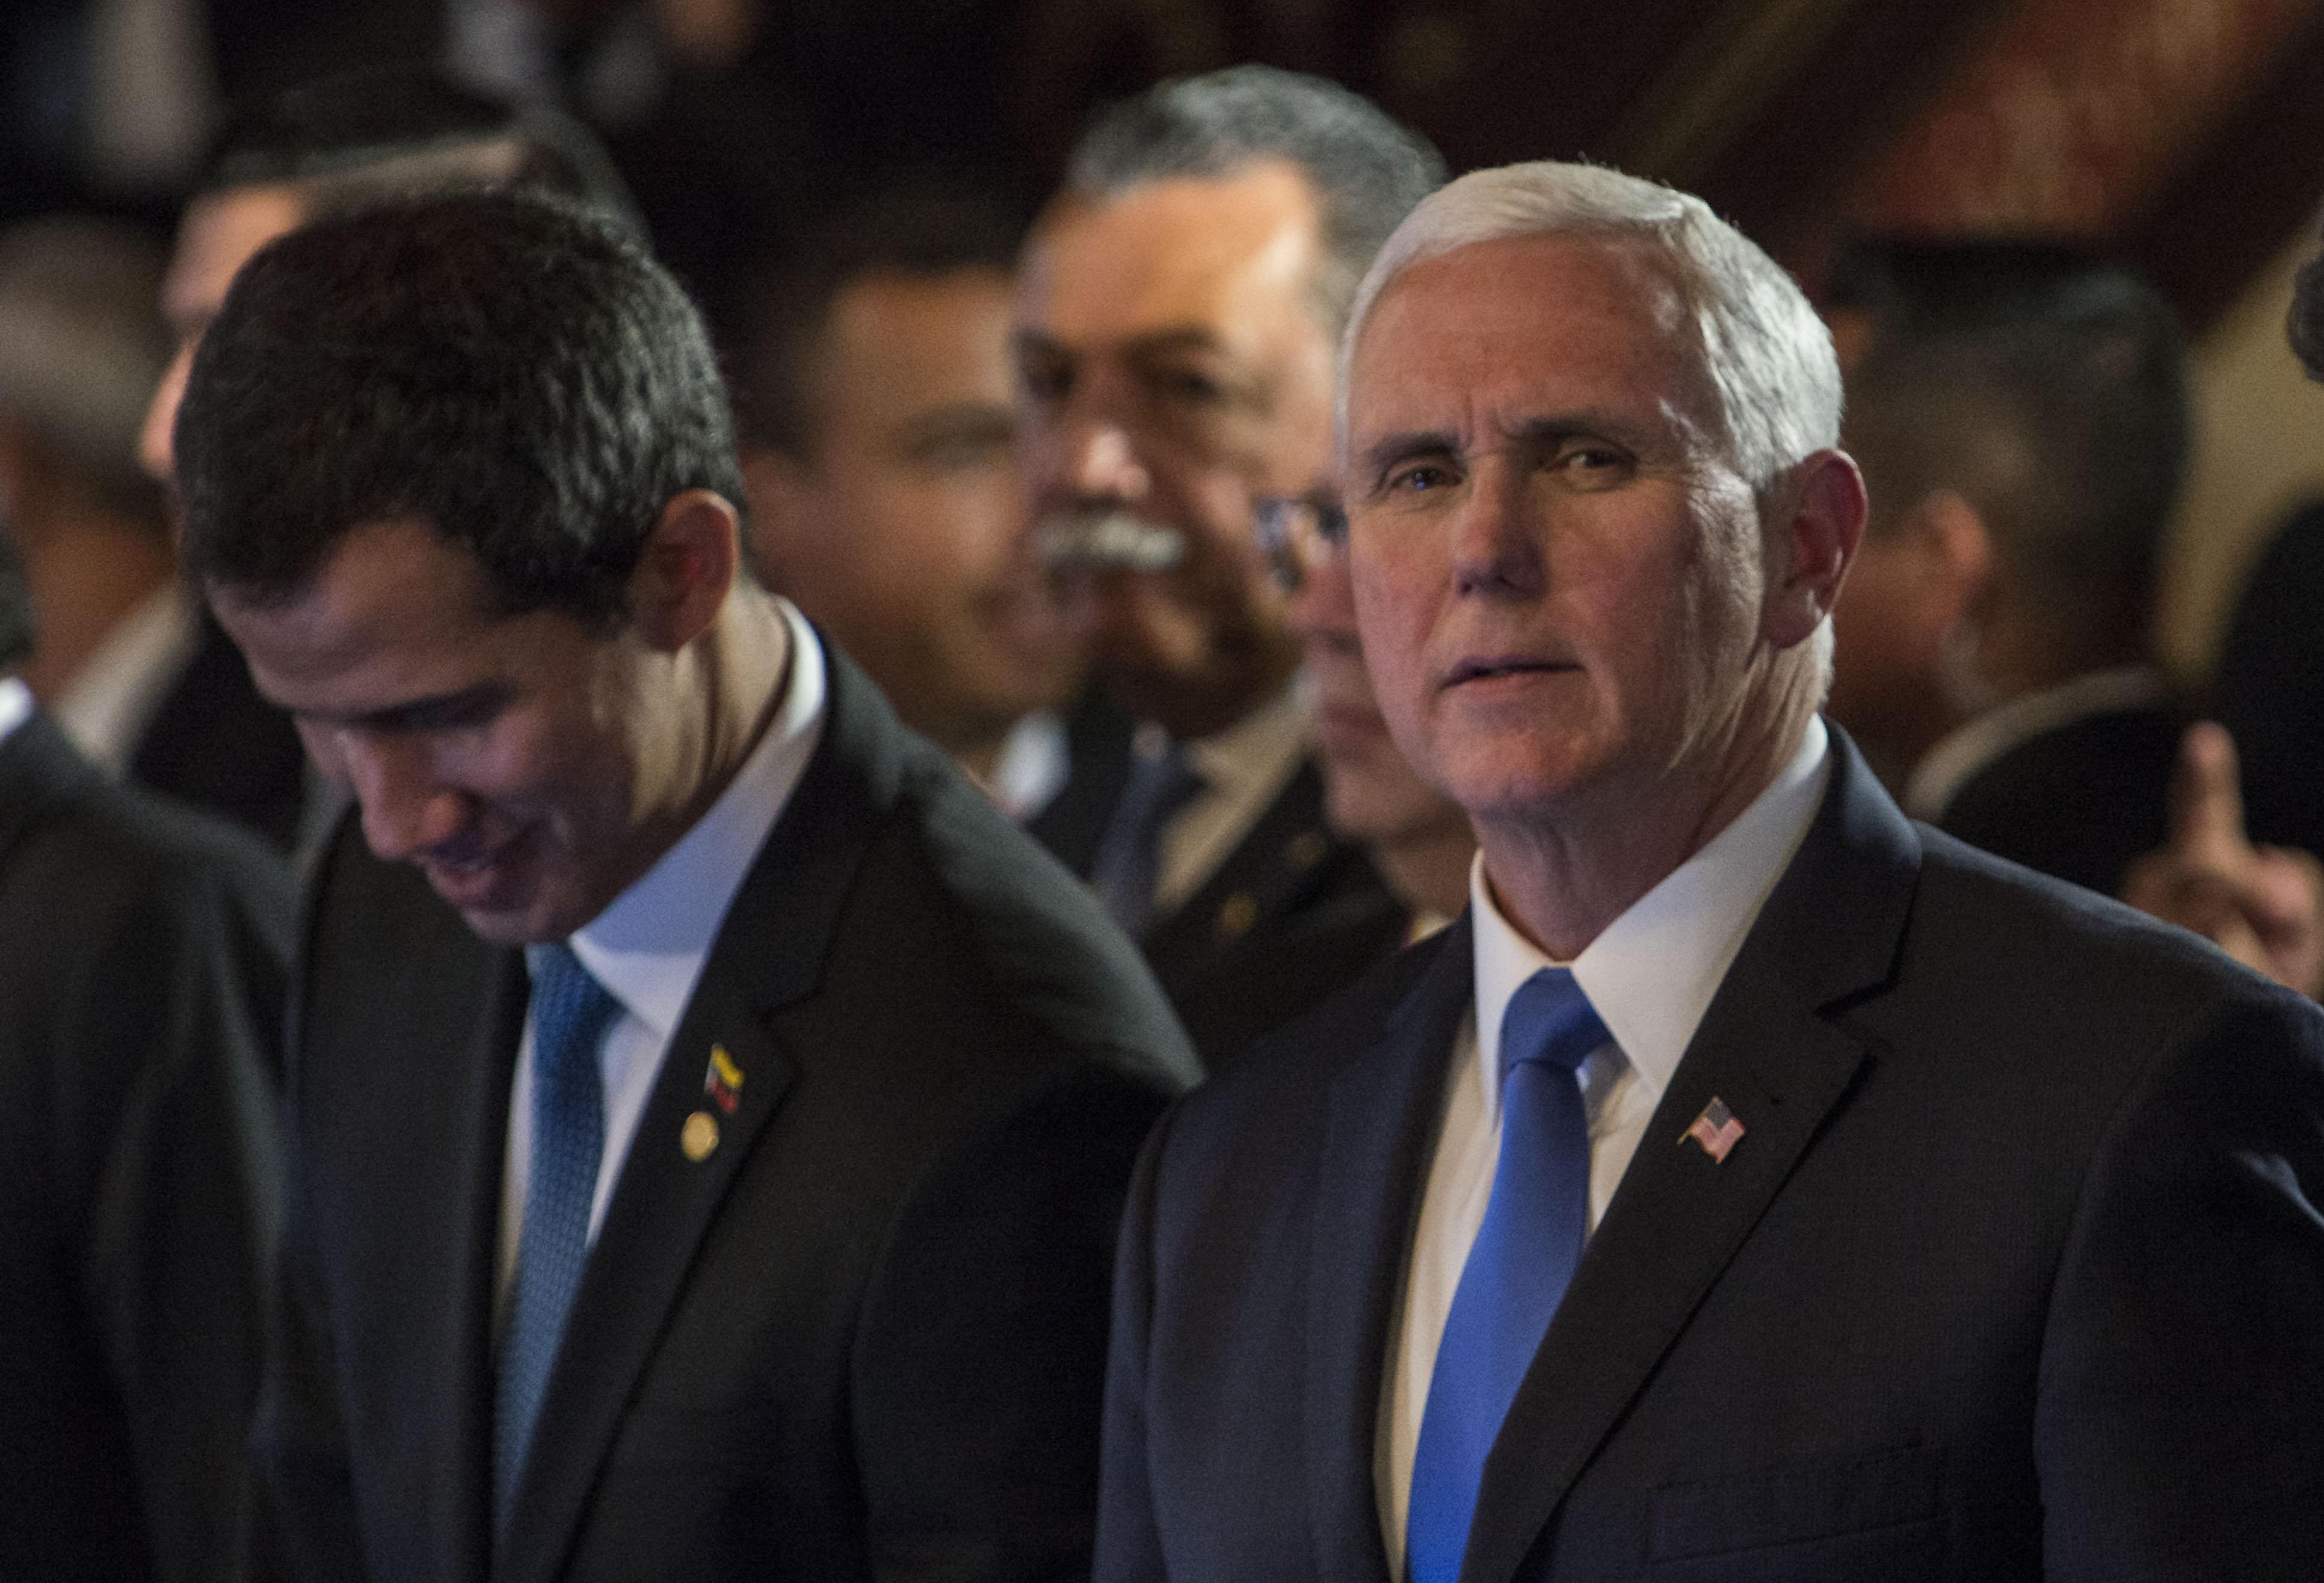 Vice President Mike Pence and Juan Guaido